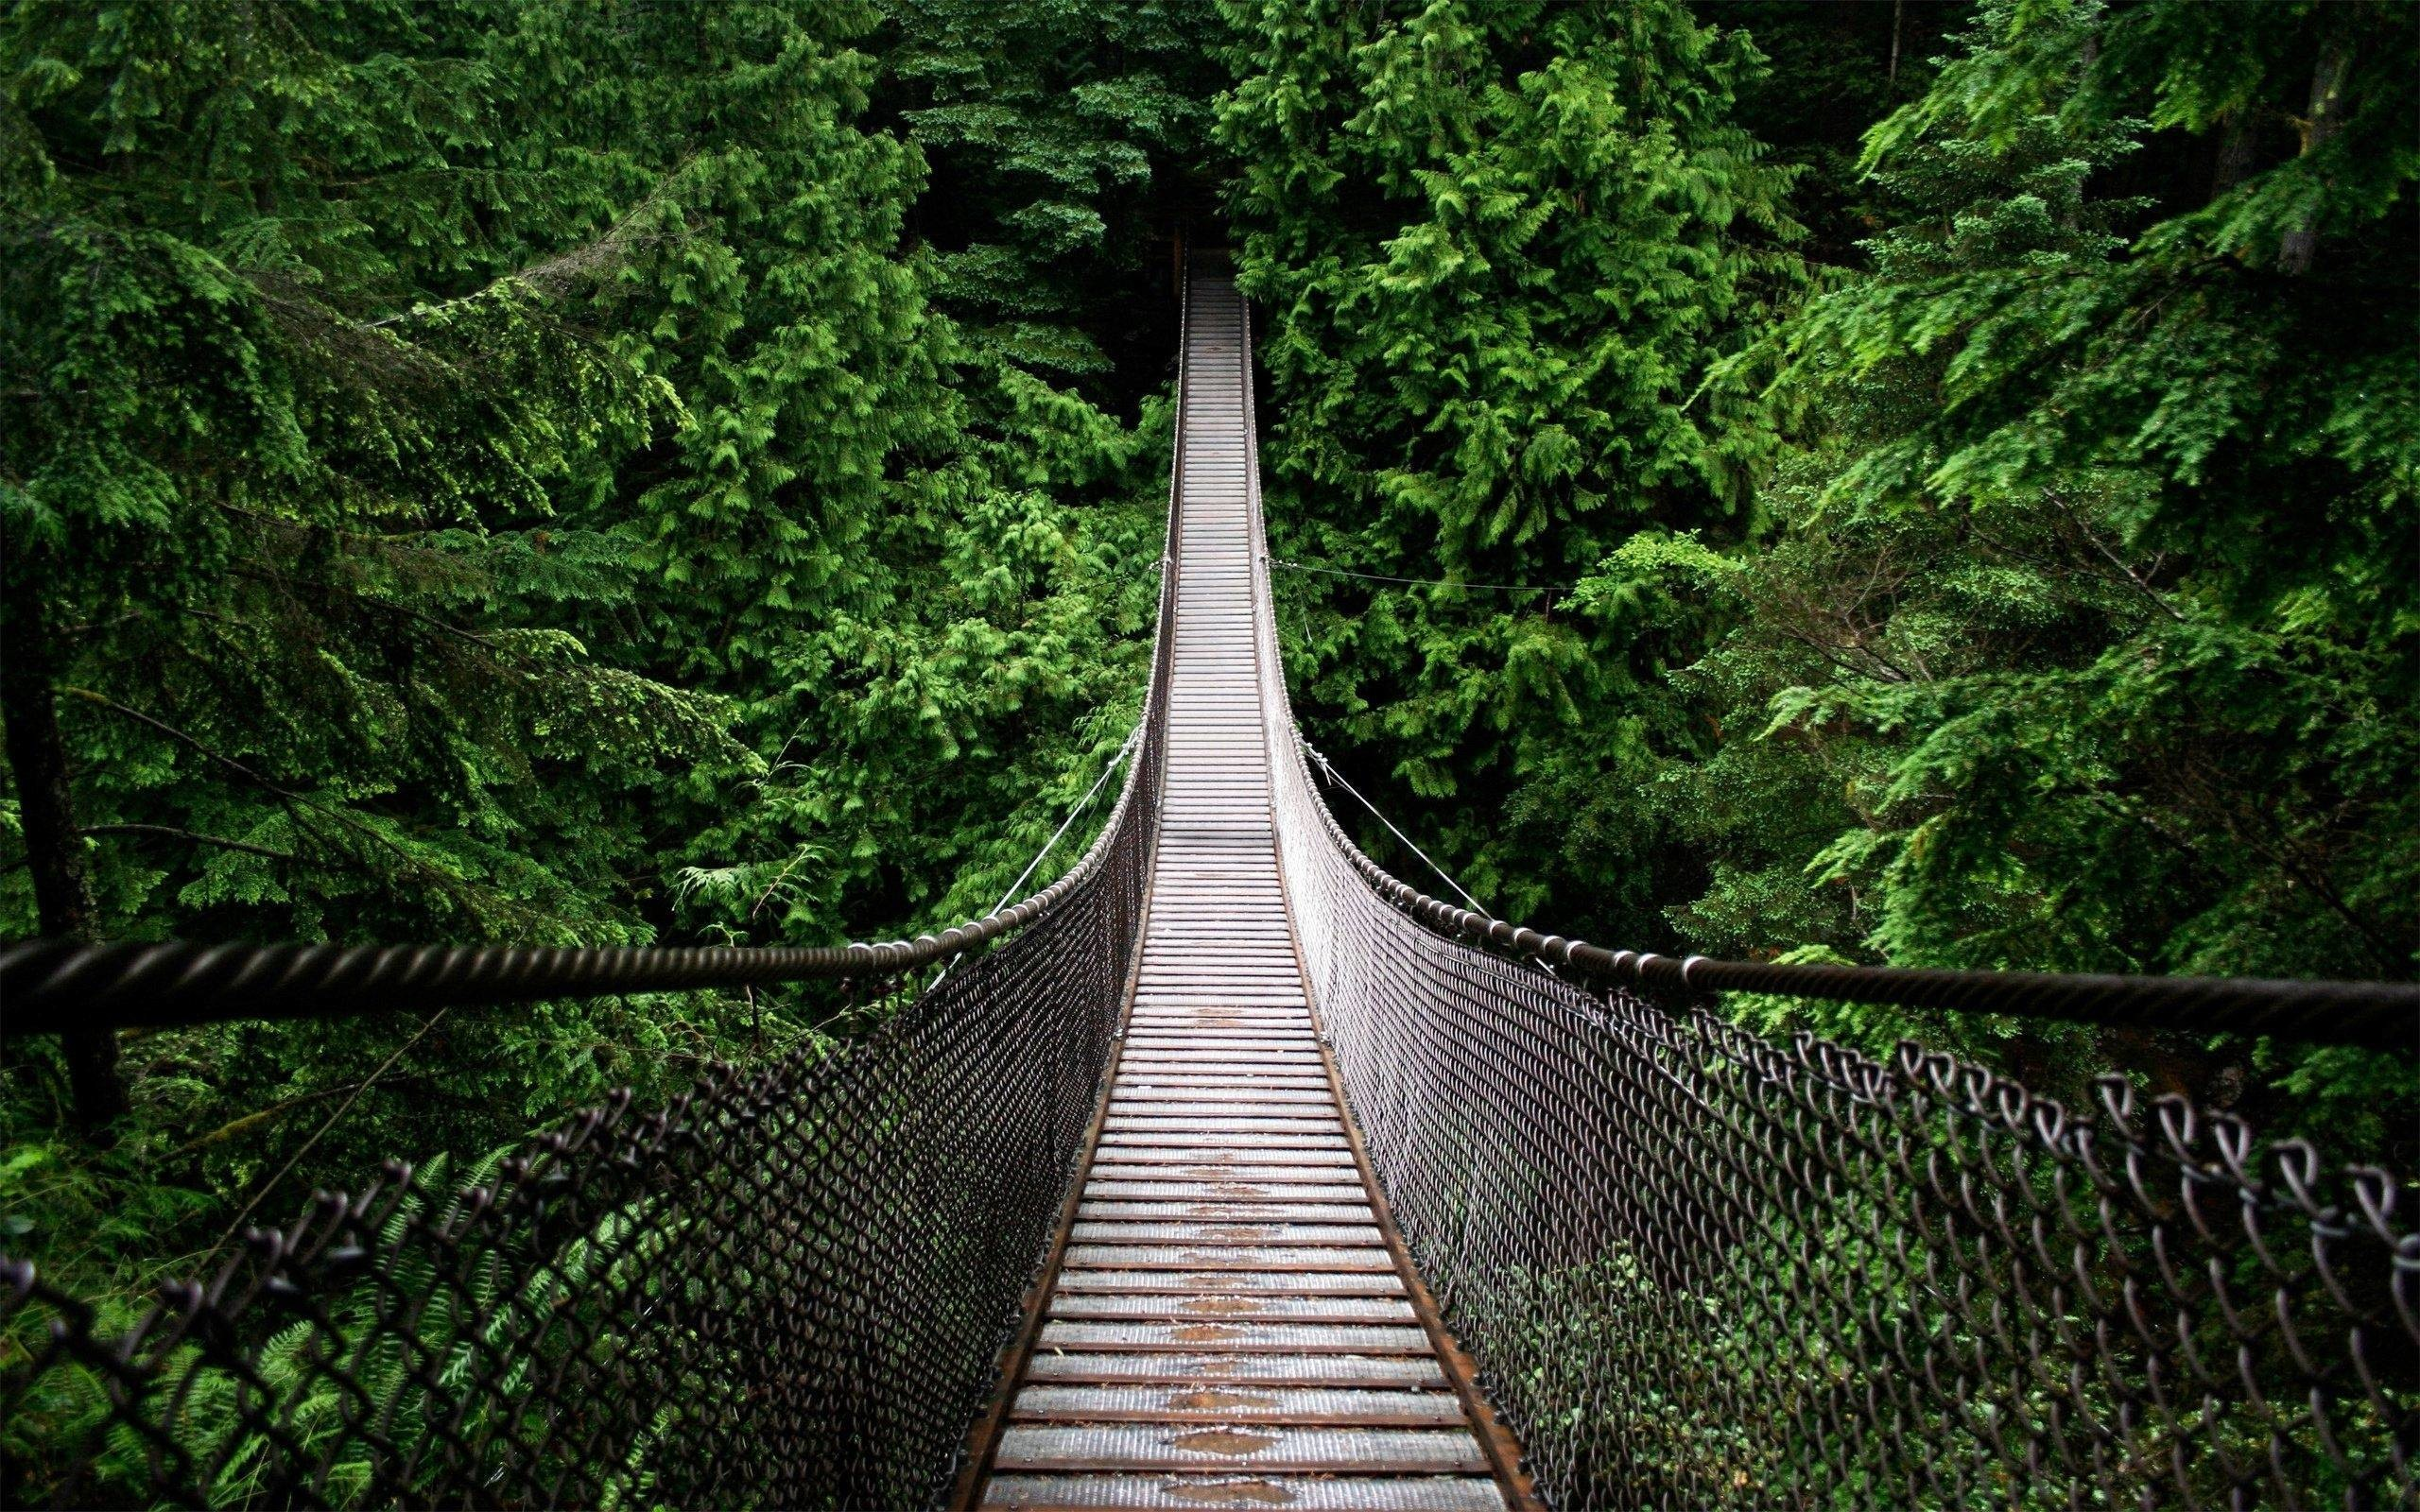 Rain Forest Wallpaper 42512 HD Wallpapers | fullhdwalls.